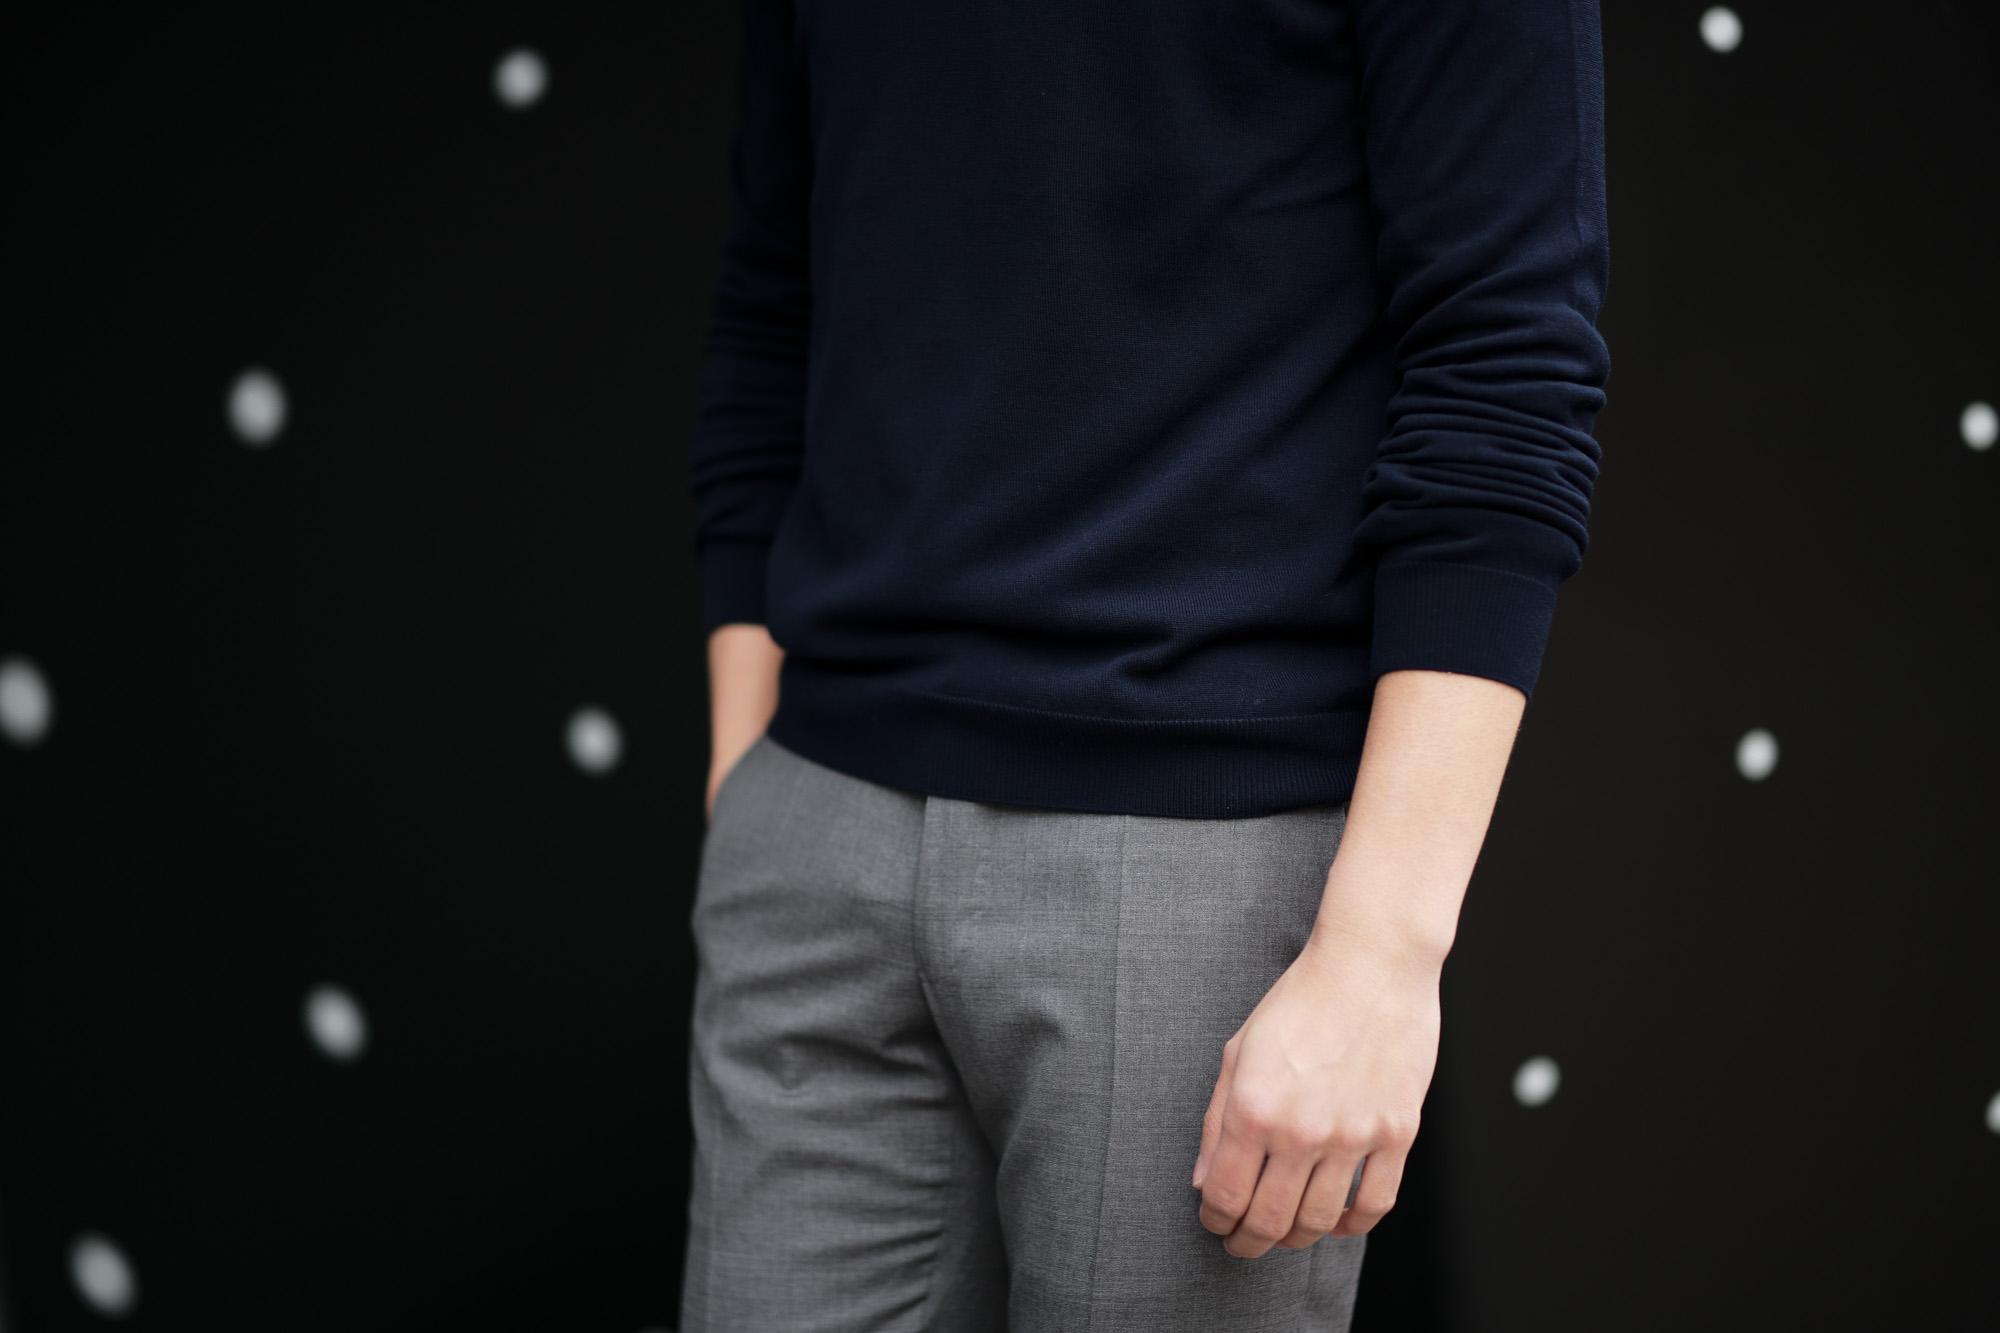 ZANONE (ザノーネ) Crew Neck Sweater (クルーネックセーター) コットンニット サマーセーター NAVY (ネイビー・Z0542)  made in italy (イタリア製) 2019 春夏新作 愛知 名古屋 altoediritto アルトエデリット